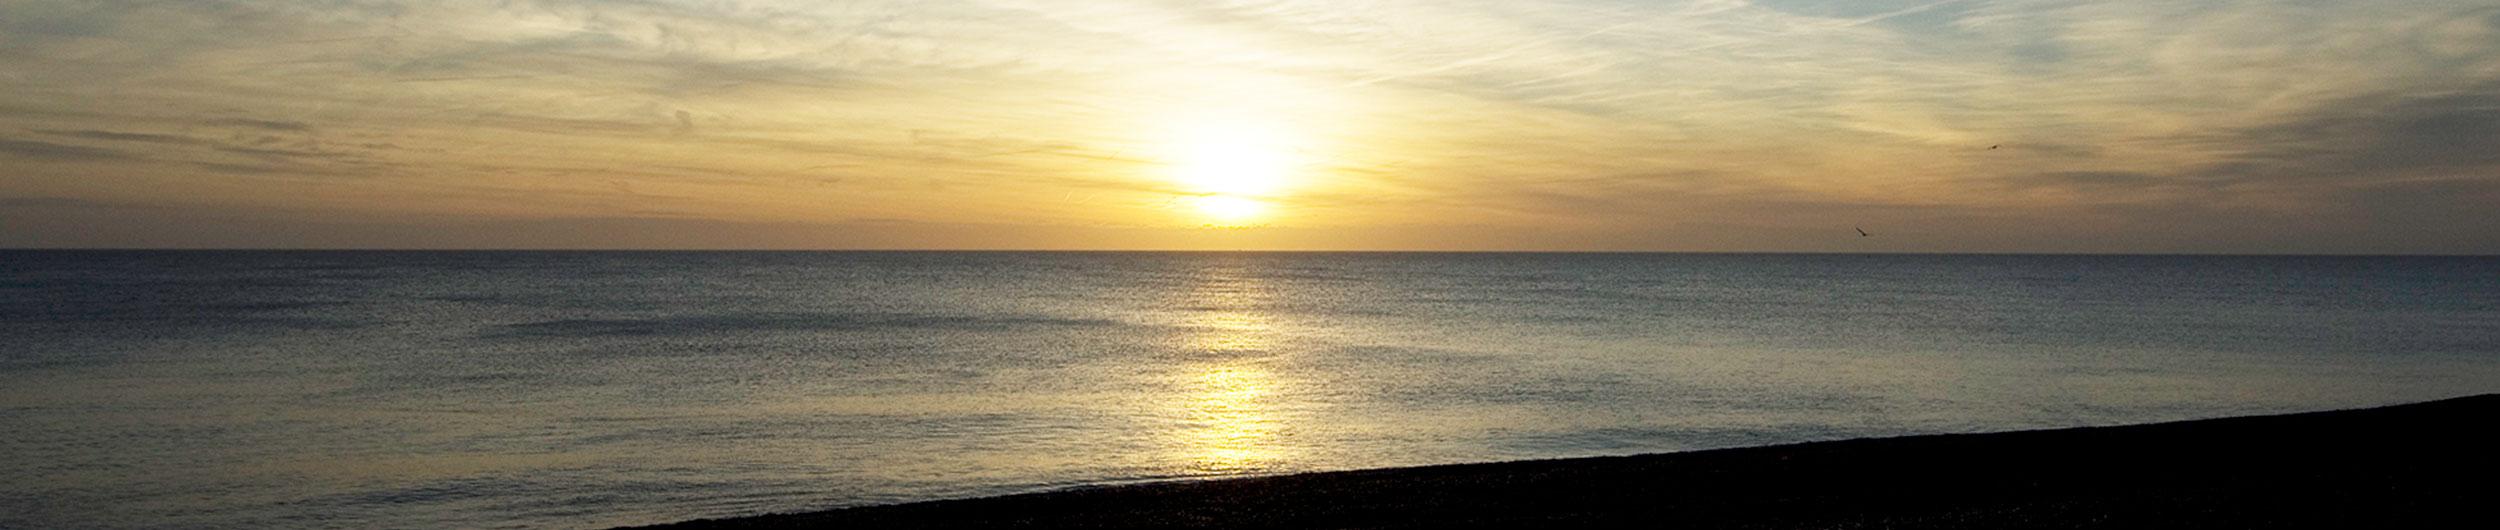 wardens-tale-suffolk-coast1-sizewell-holiday